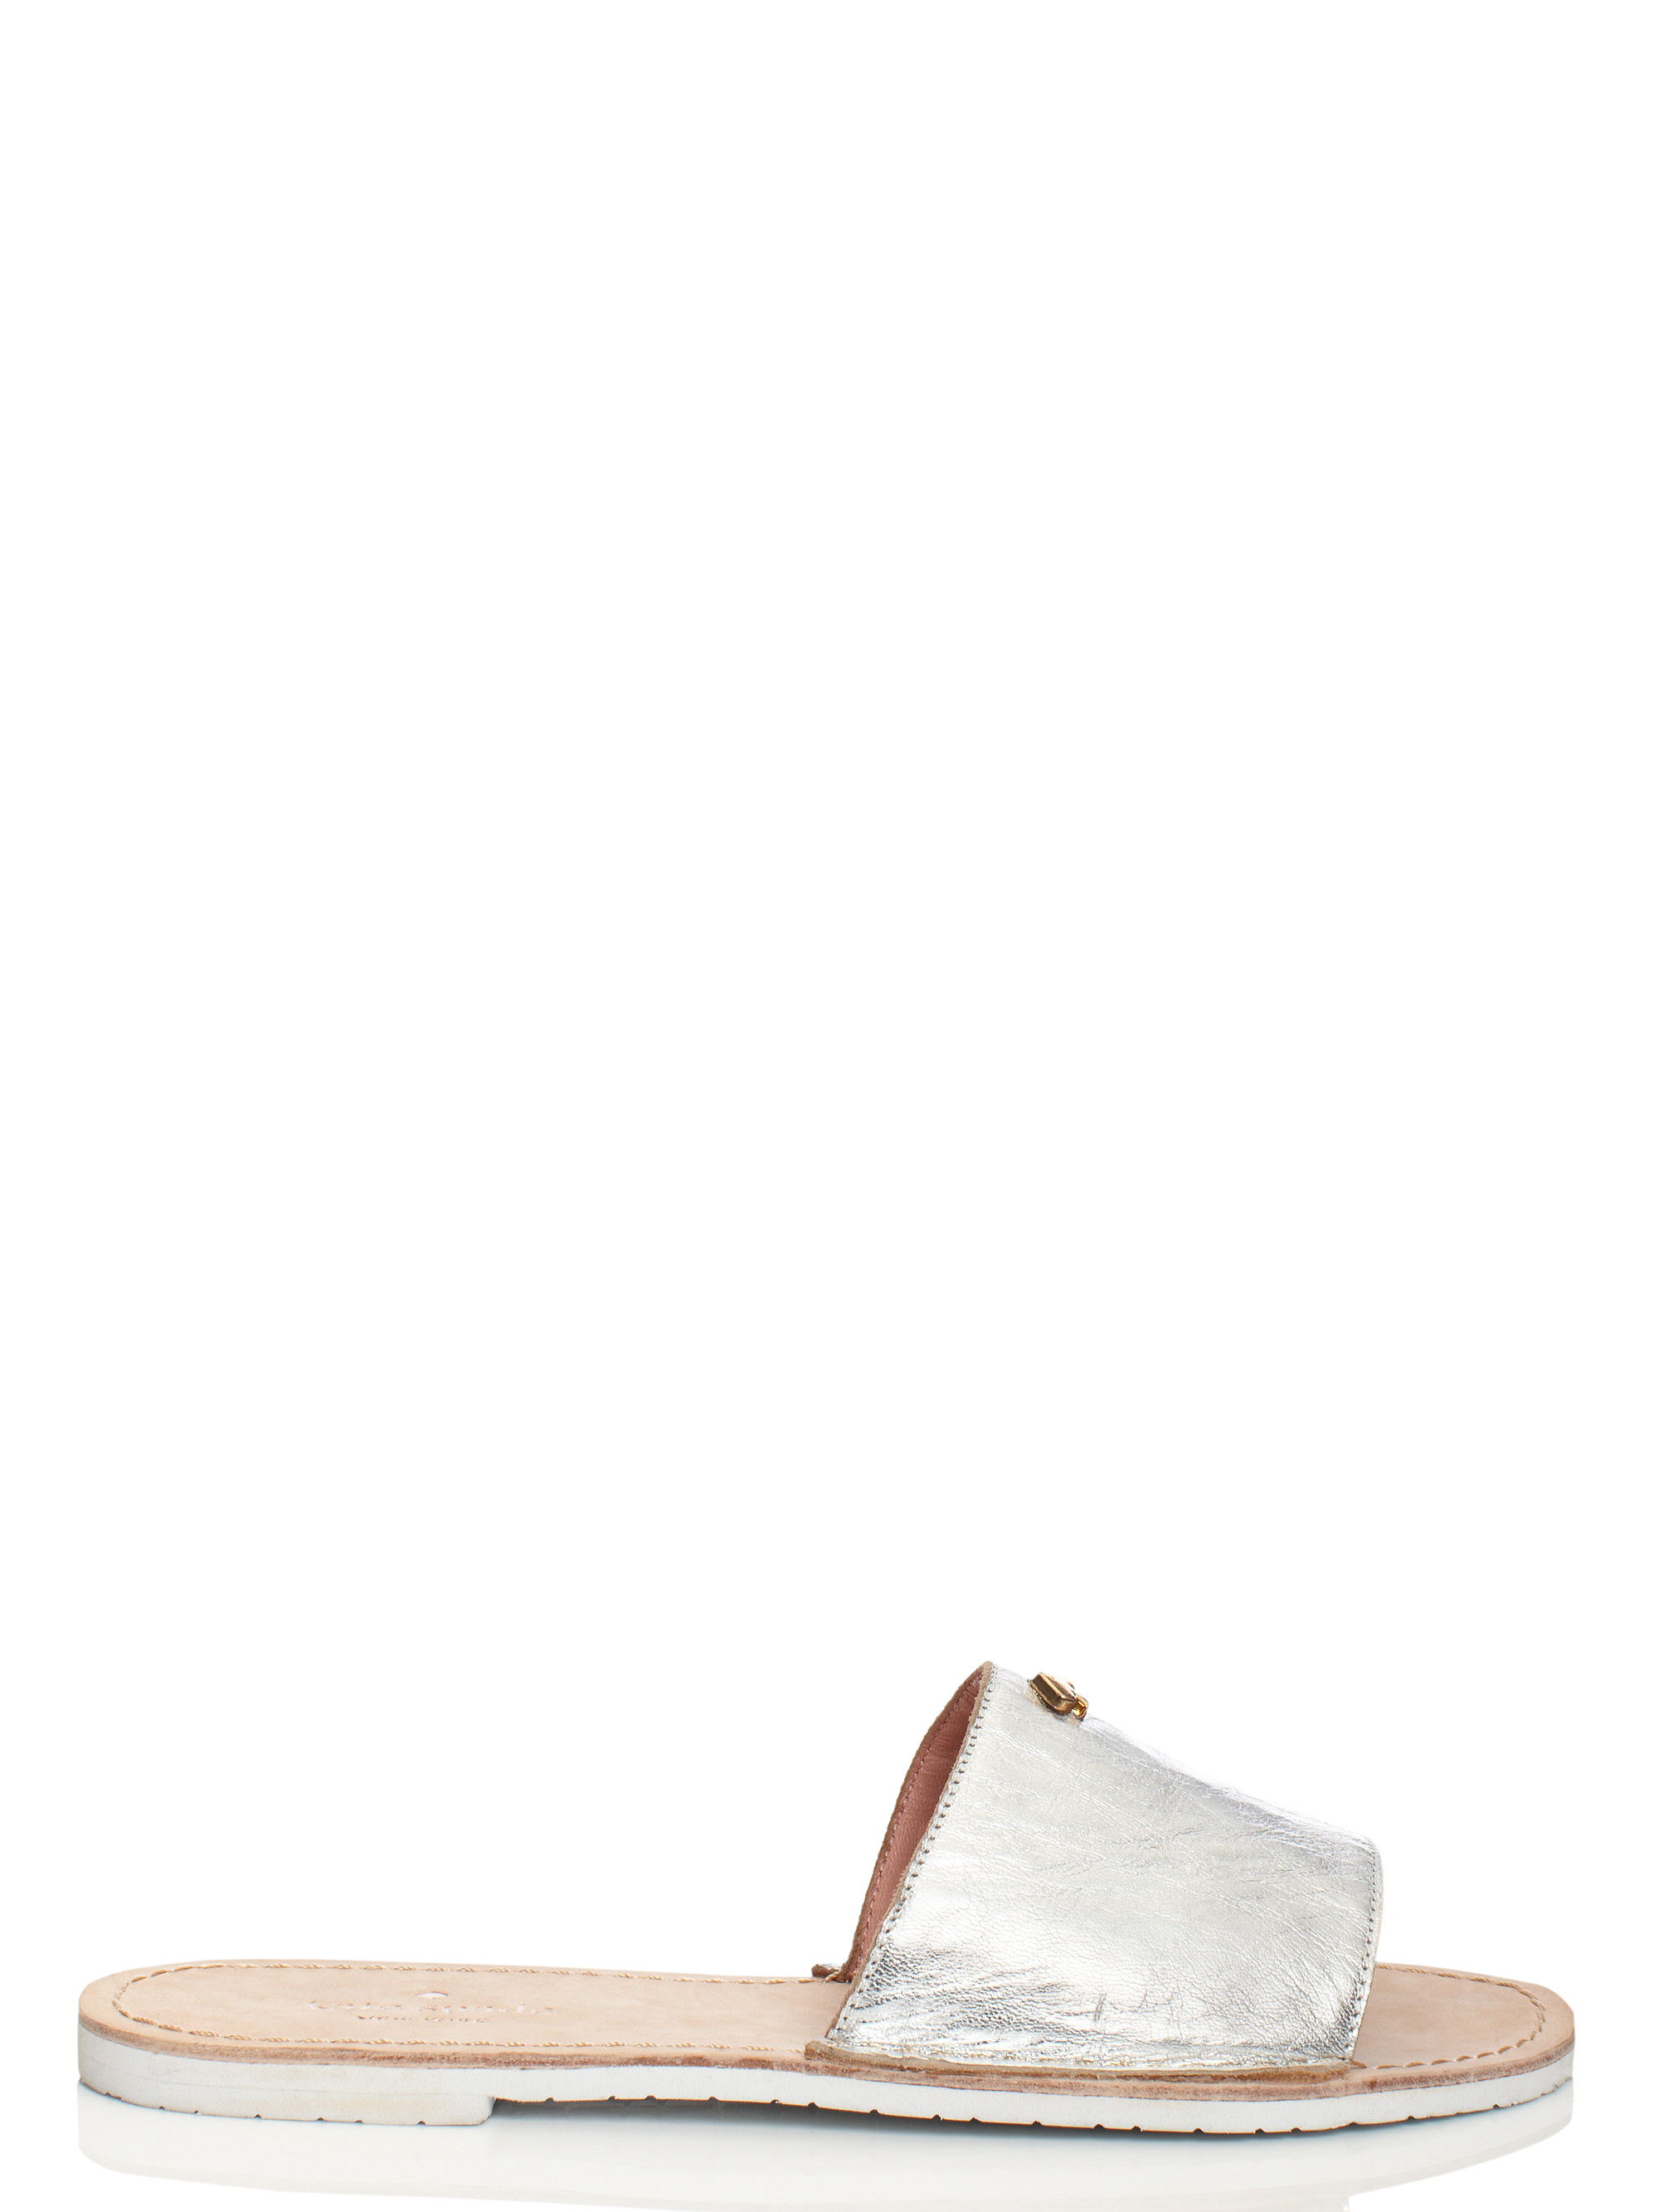 83ba647b7141 Lyst - Kate Spade Imperiale Sandals in Metallic